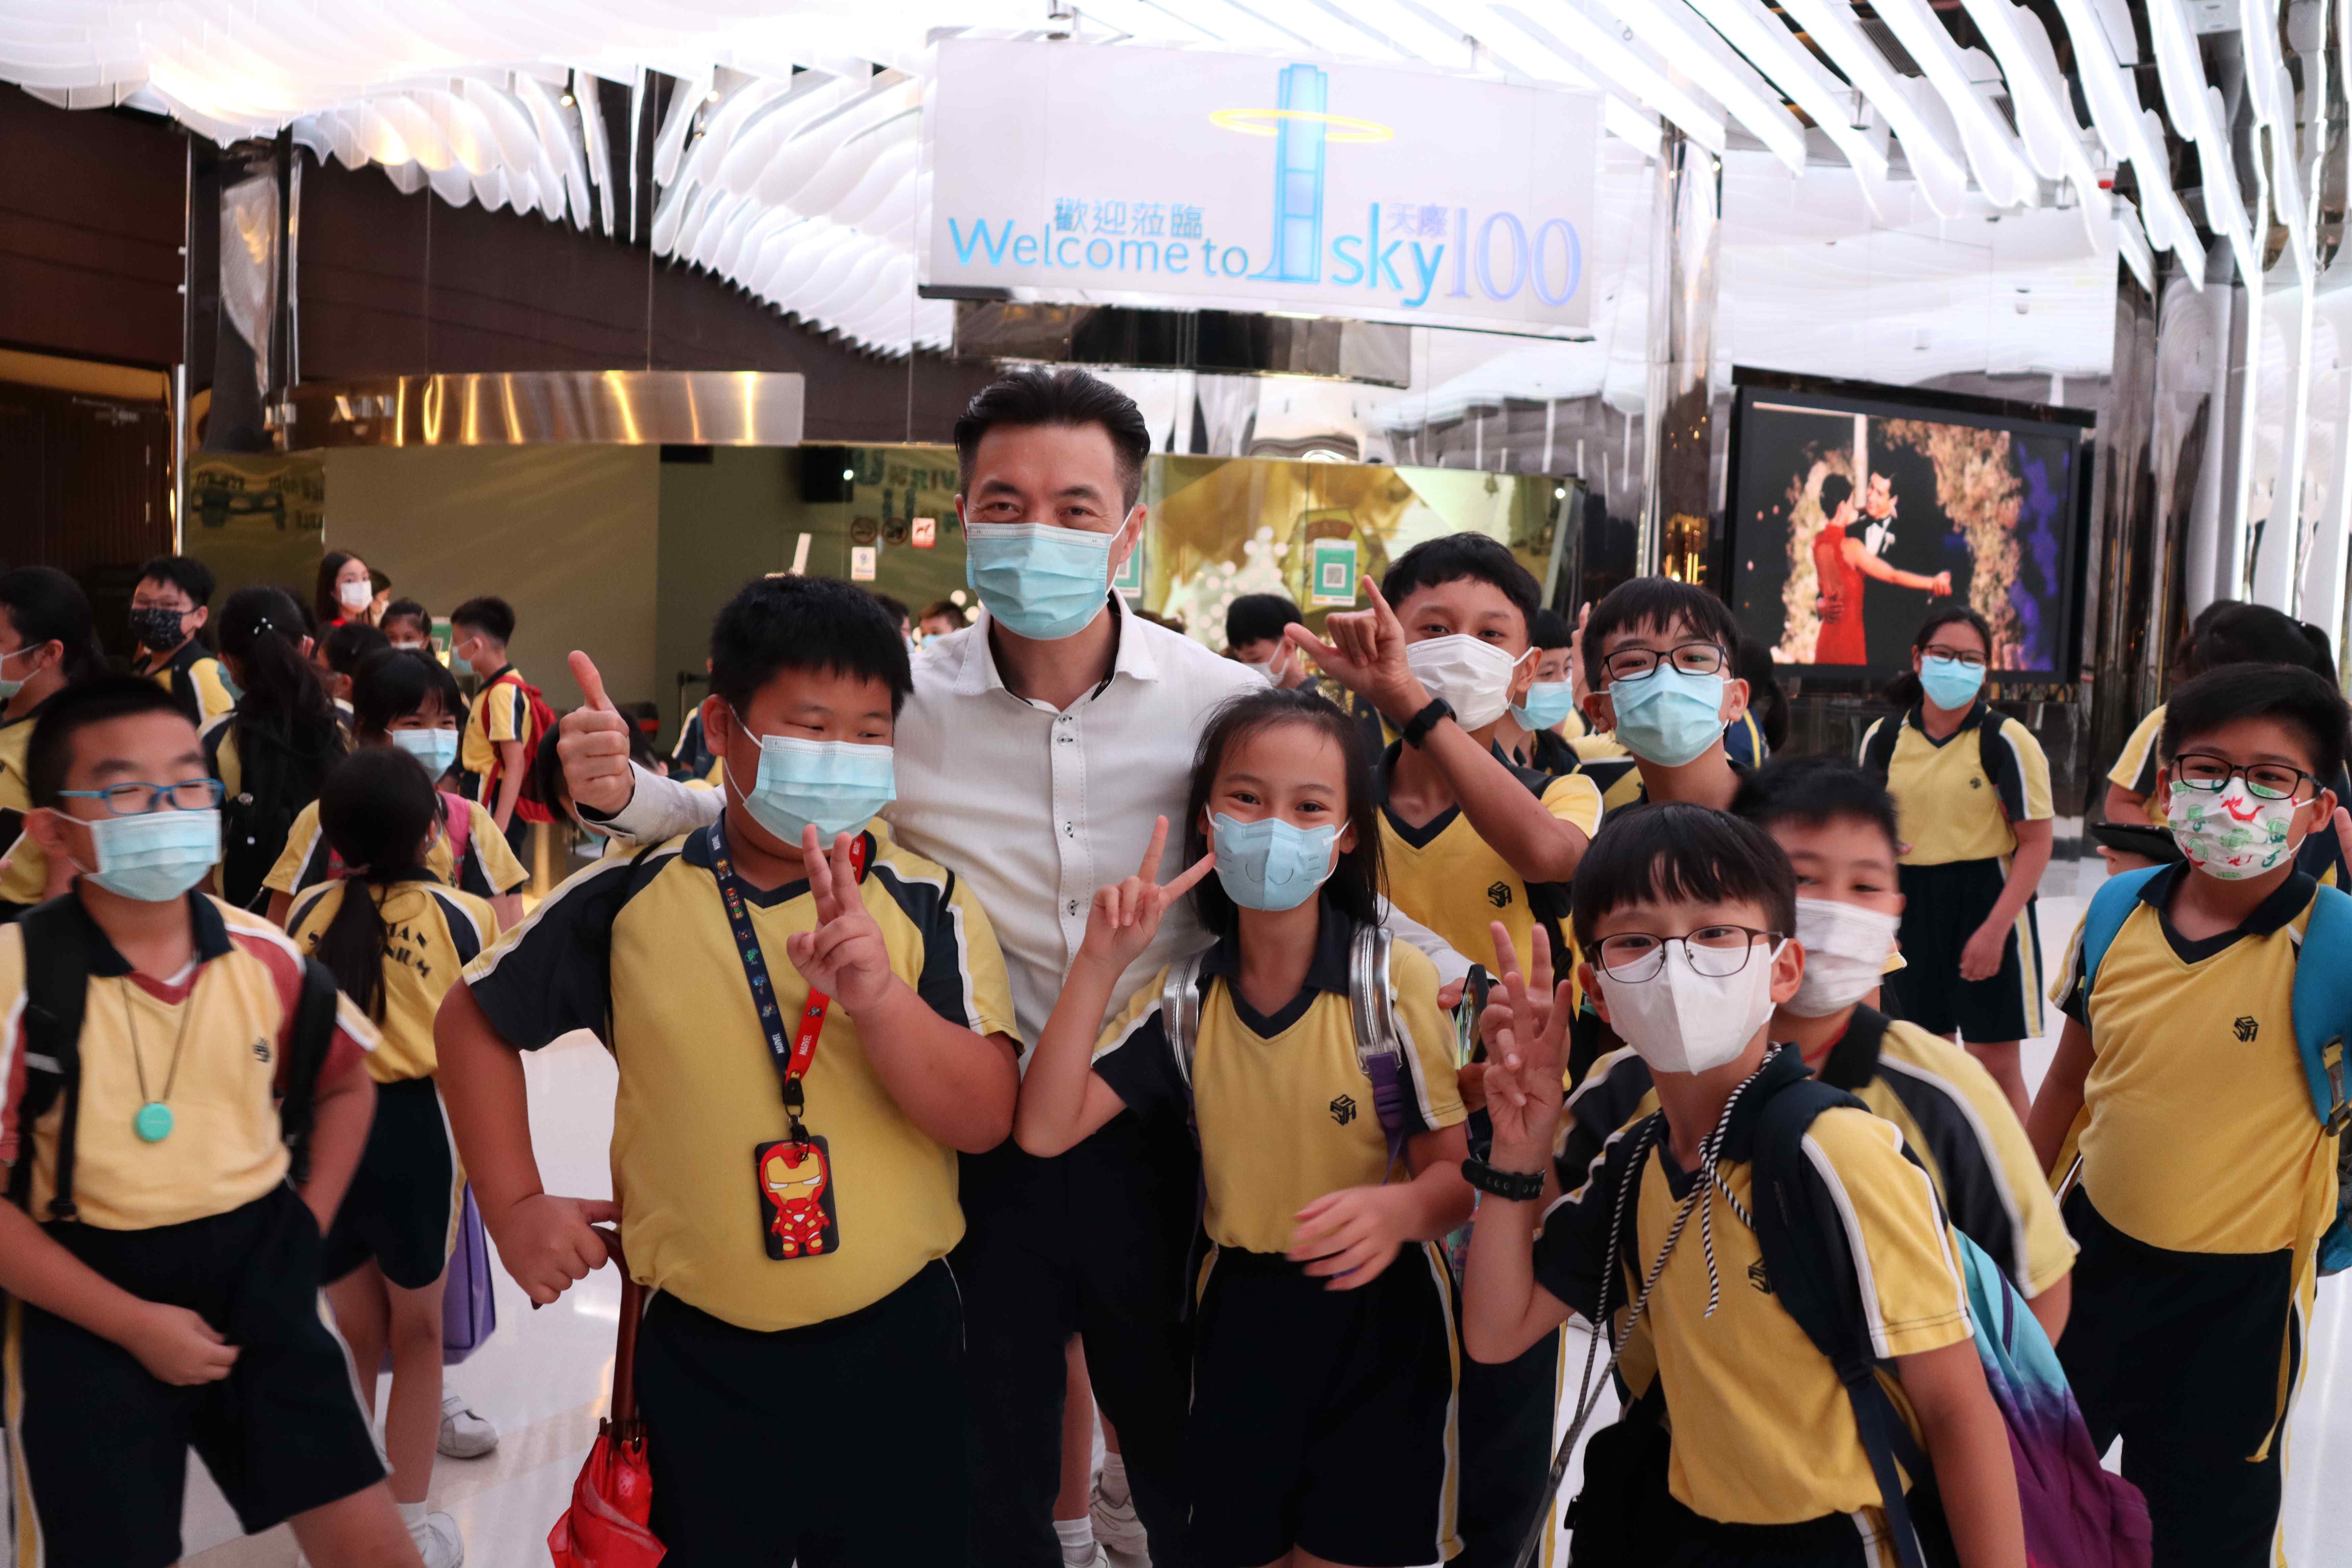 https://syh.edu.hk/sites/default/files/img_0425.jpg